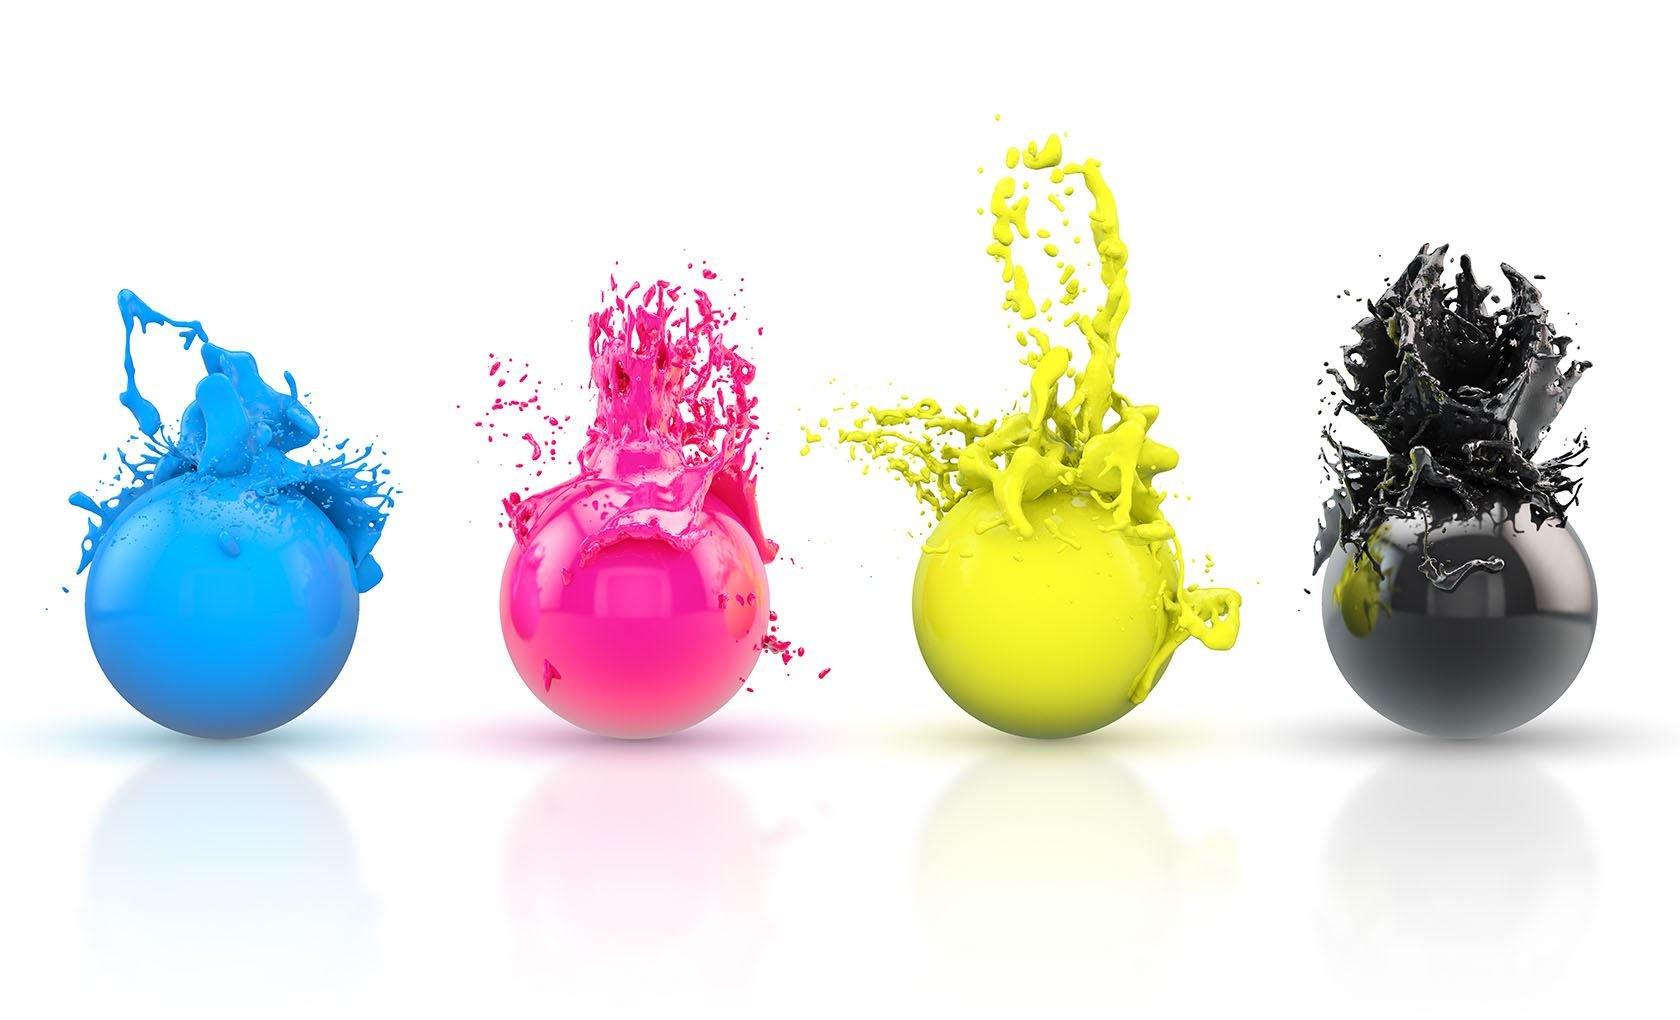 hiw-farbe-webdesign-mediengestaltung